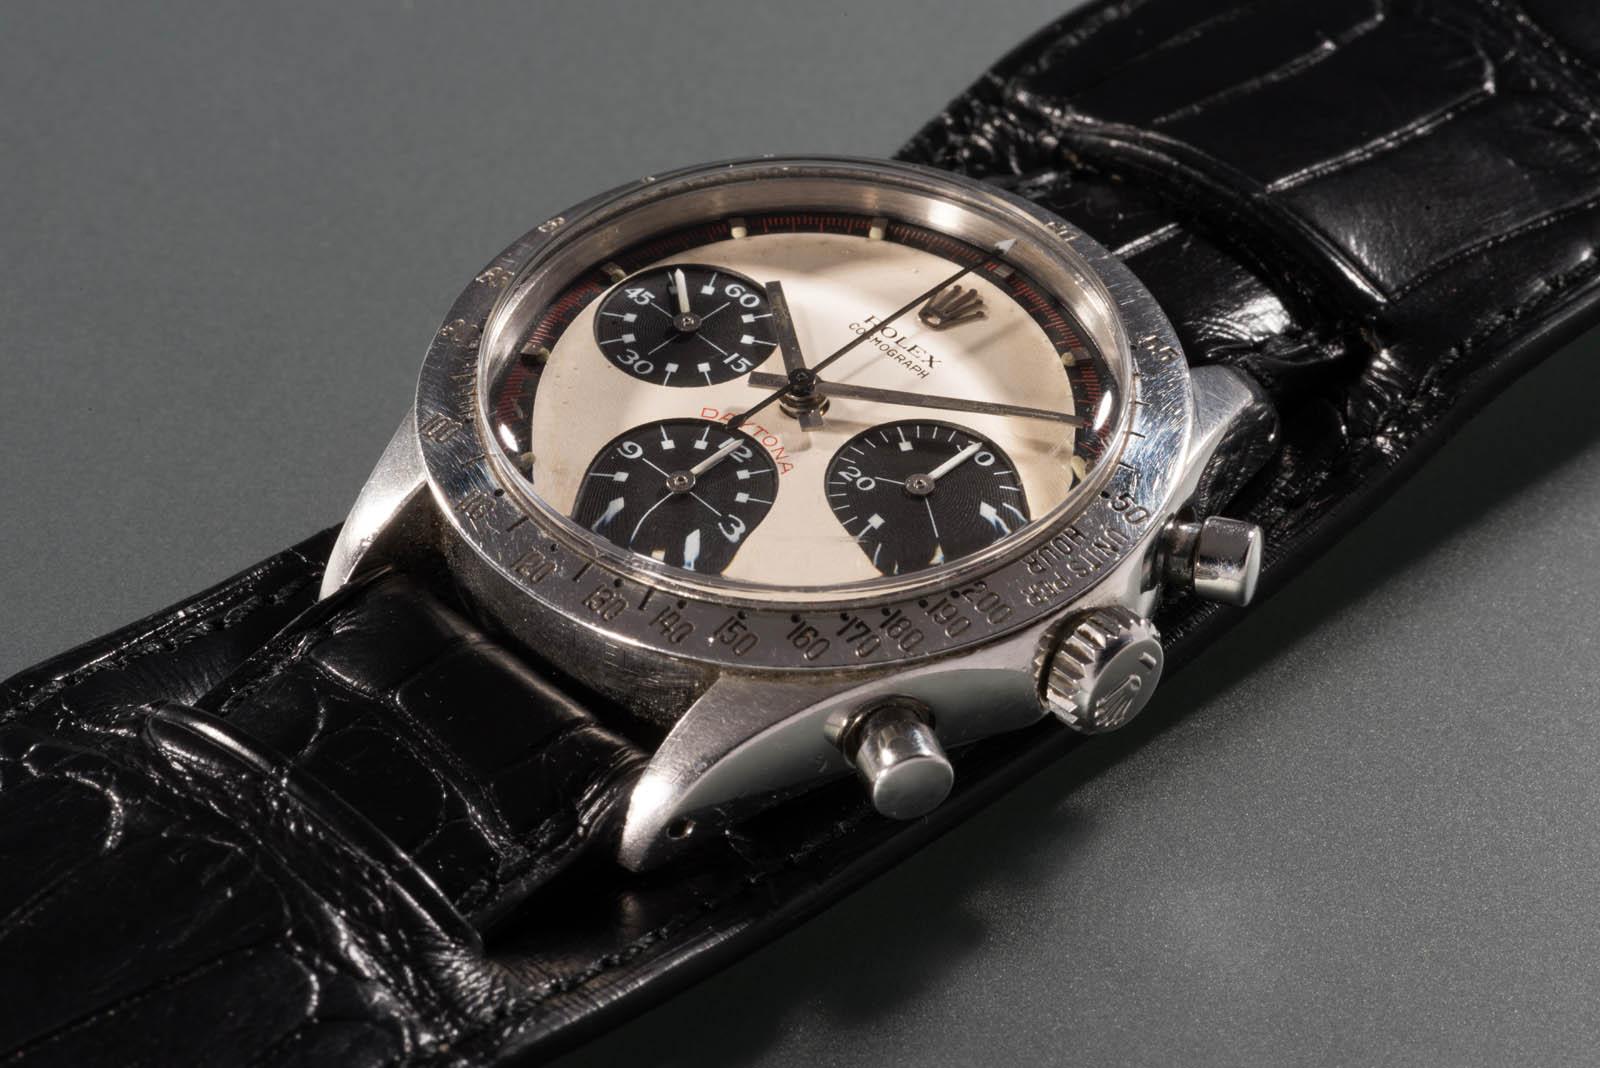 Photo of Ποιανού το ρολόι πωλήθηκε έναντι 17,8 εκατομμυρίων δολαρίων;